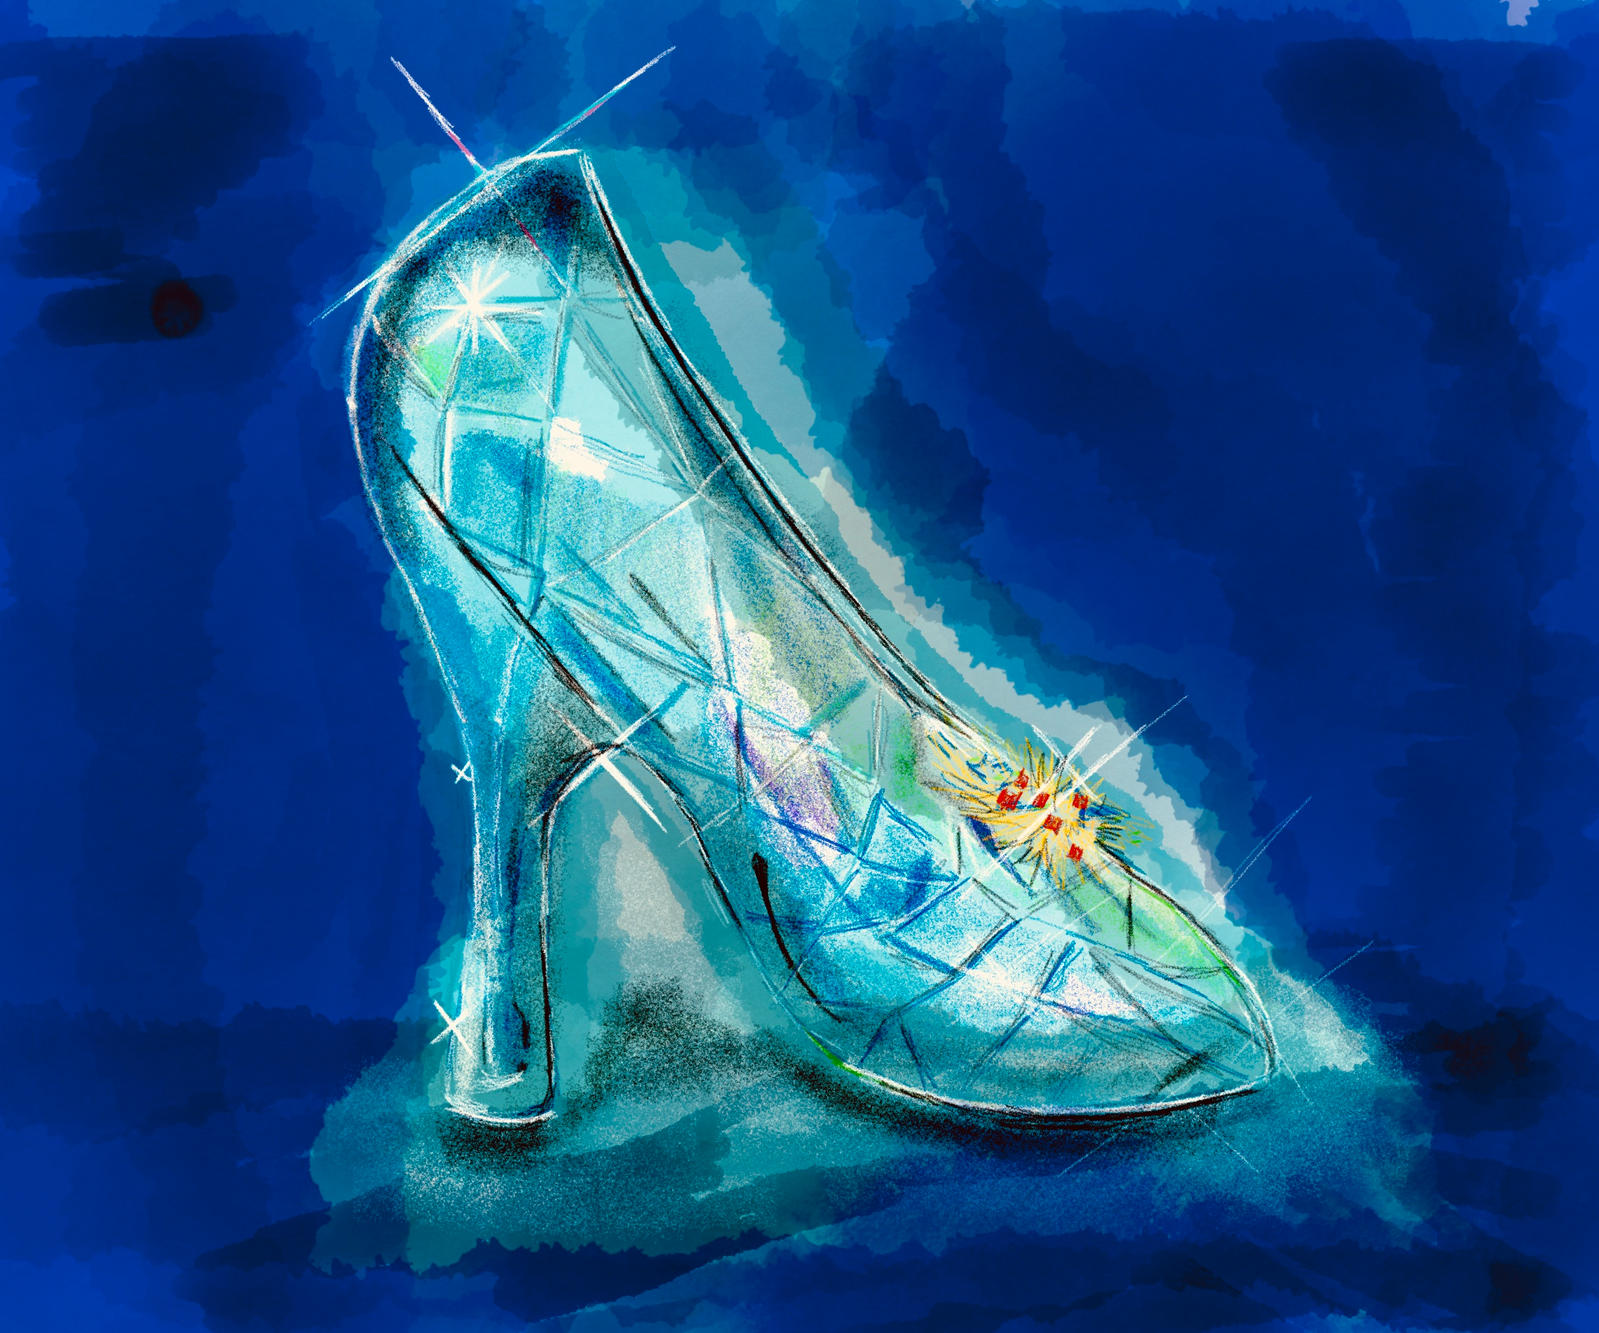 Cinderellas crystal glass slipper by KateHodges